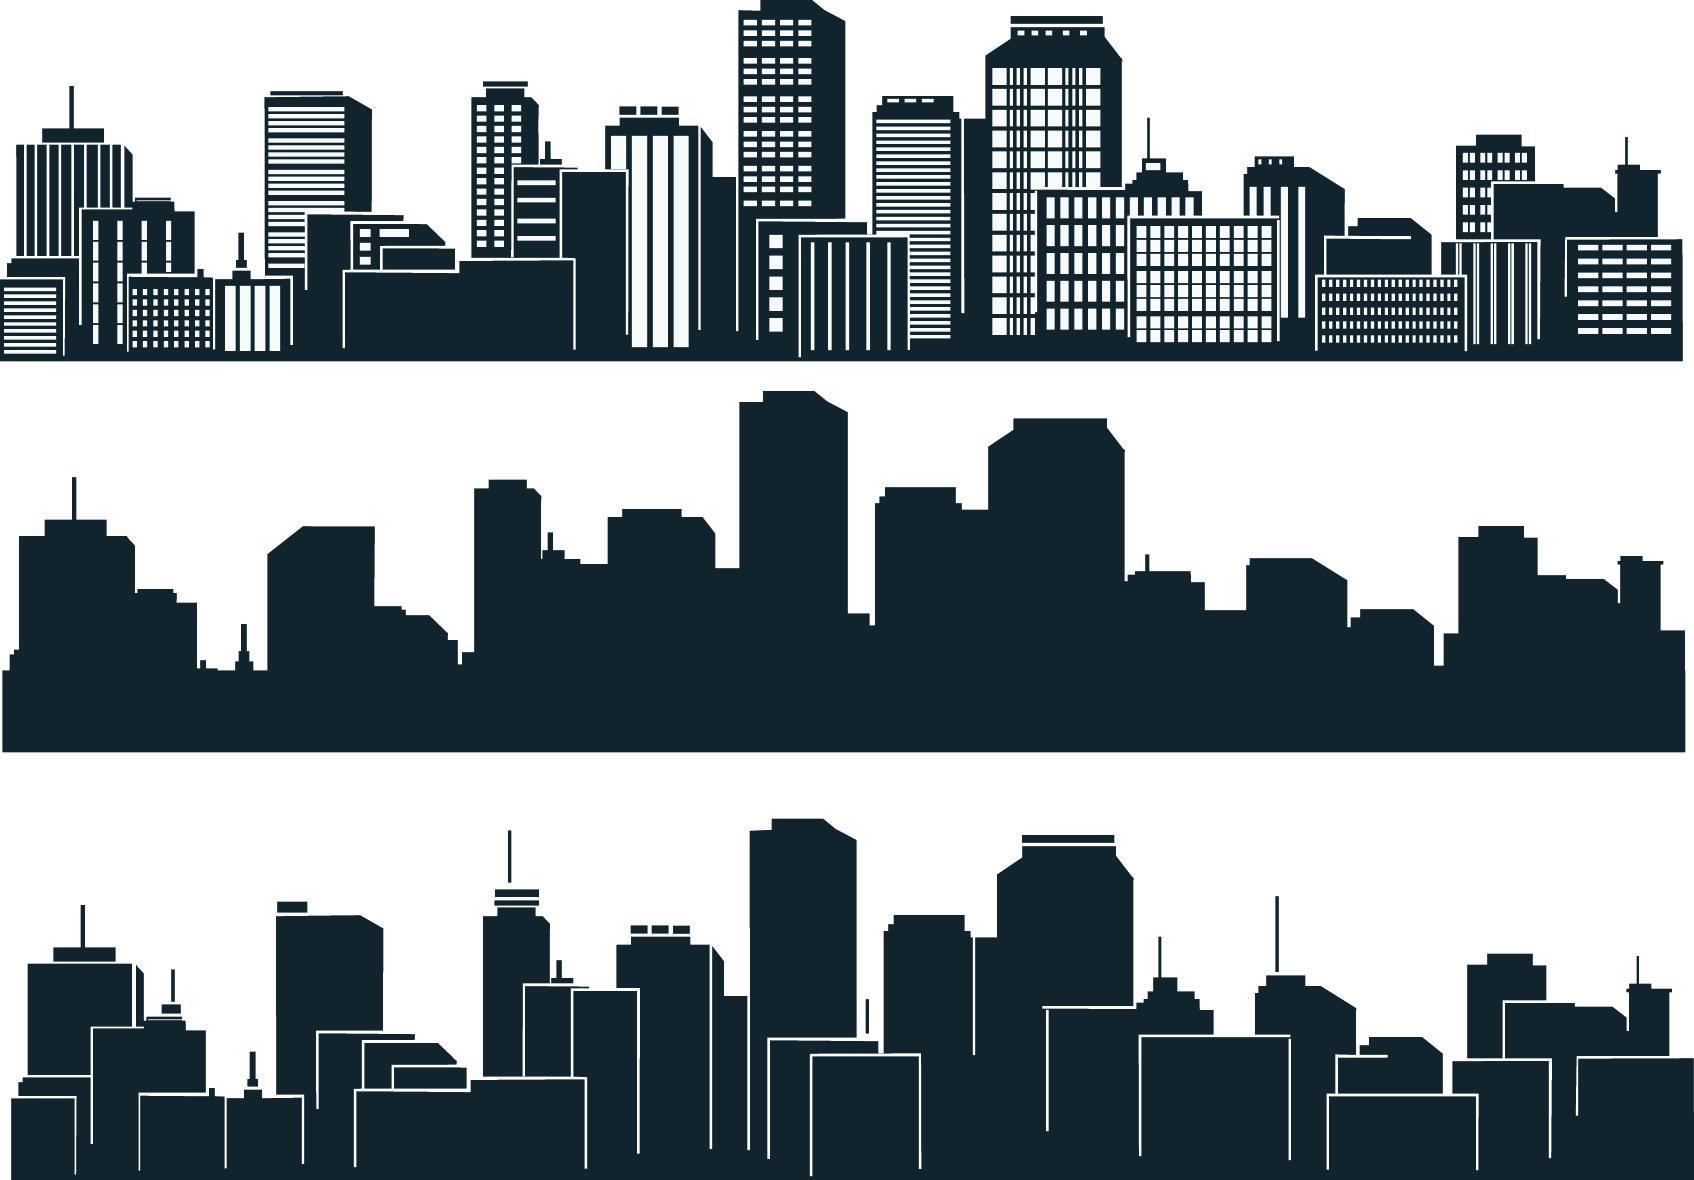 city silhouette - Google Search   Building silhouette, City buildings, City vector